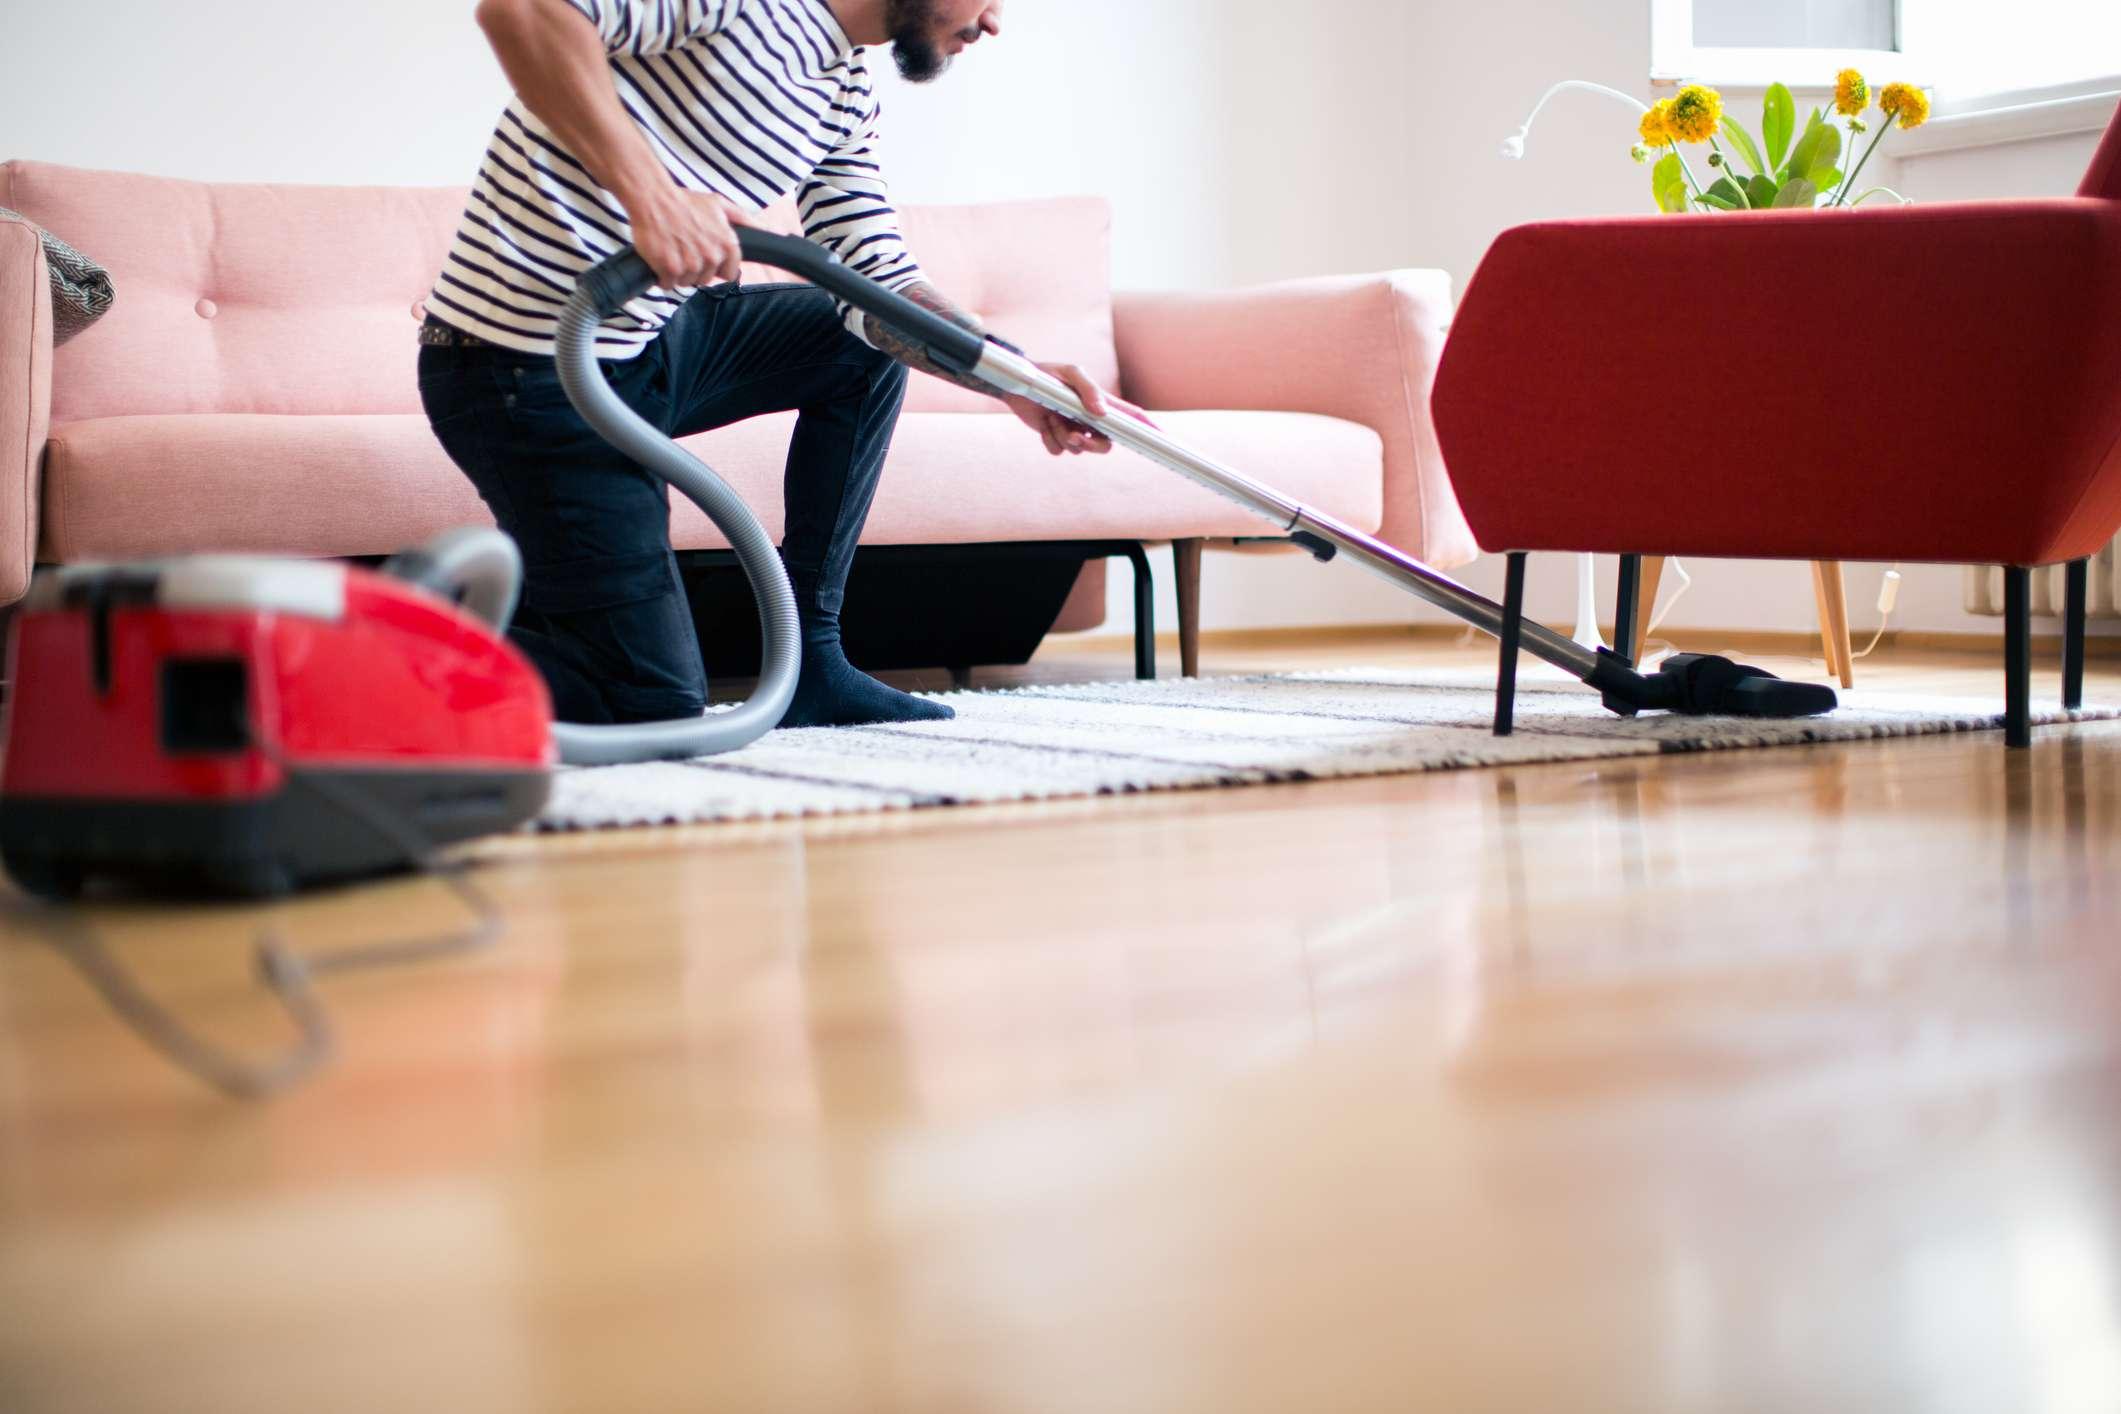 Man kneeling and vacuuming living room